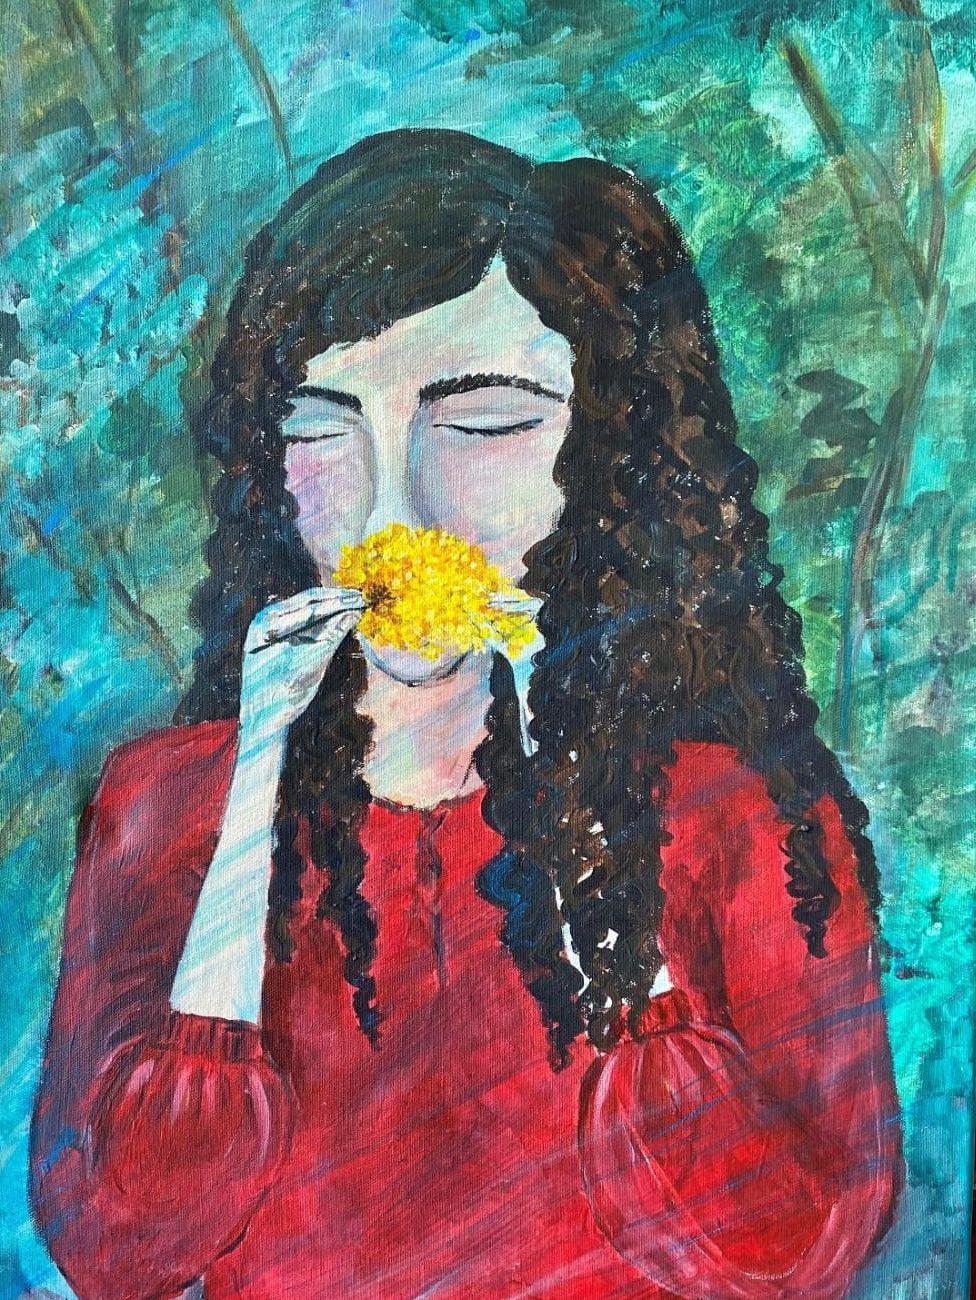 Çiçek Koklayan kız  Teknik : Guaj Boya  Ölçü : 60 x 35 cm  Fiyat 1000 TL